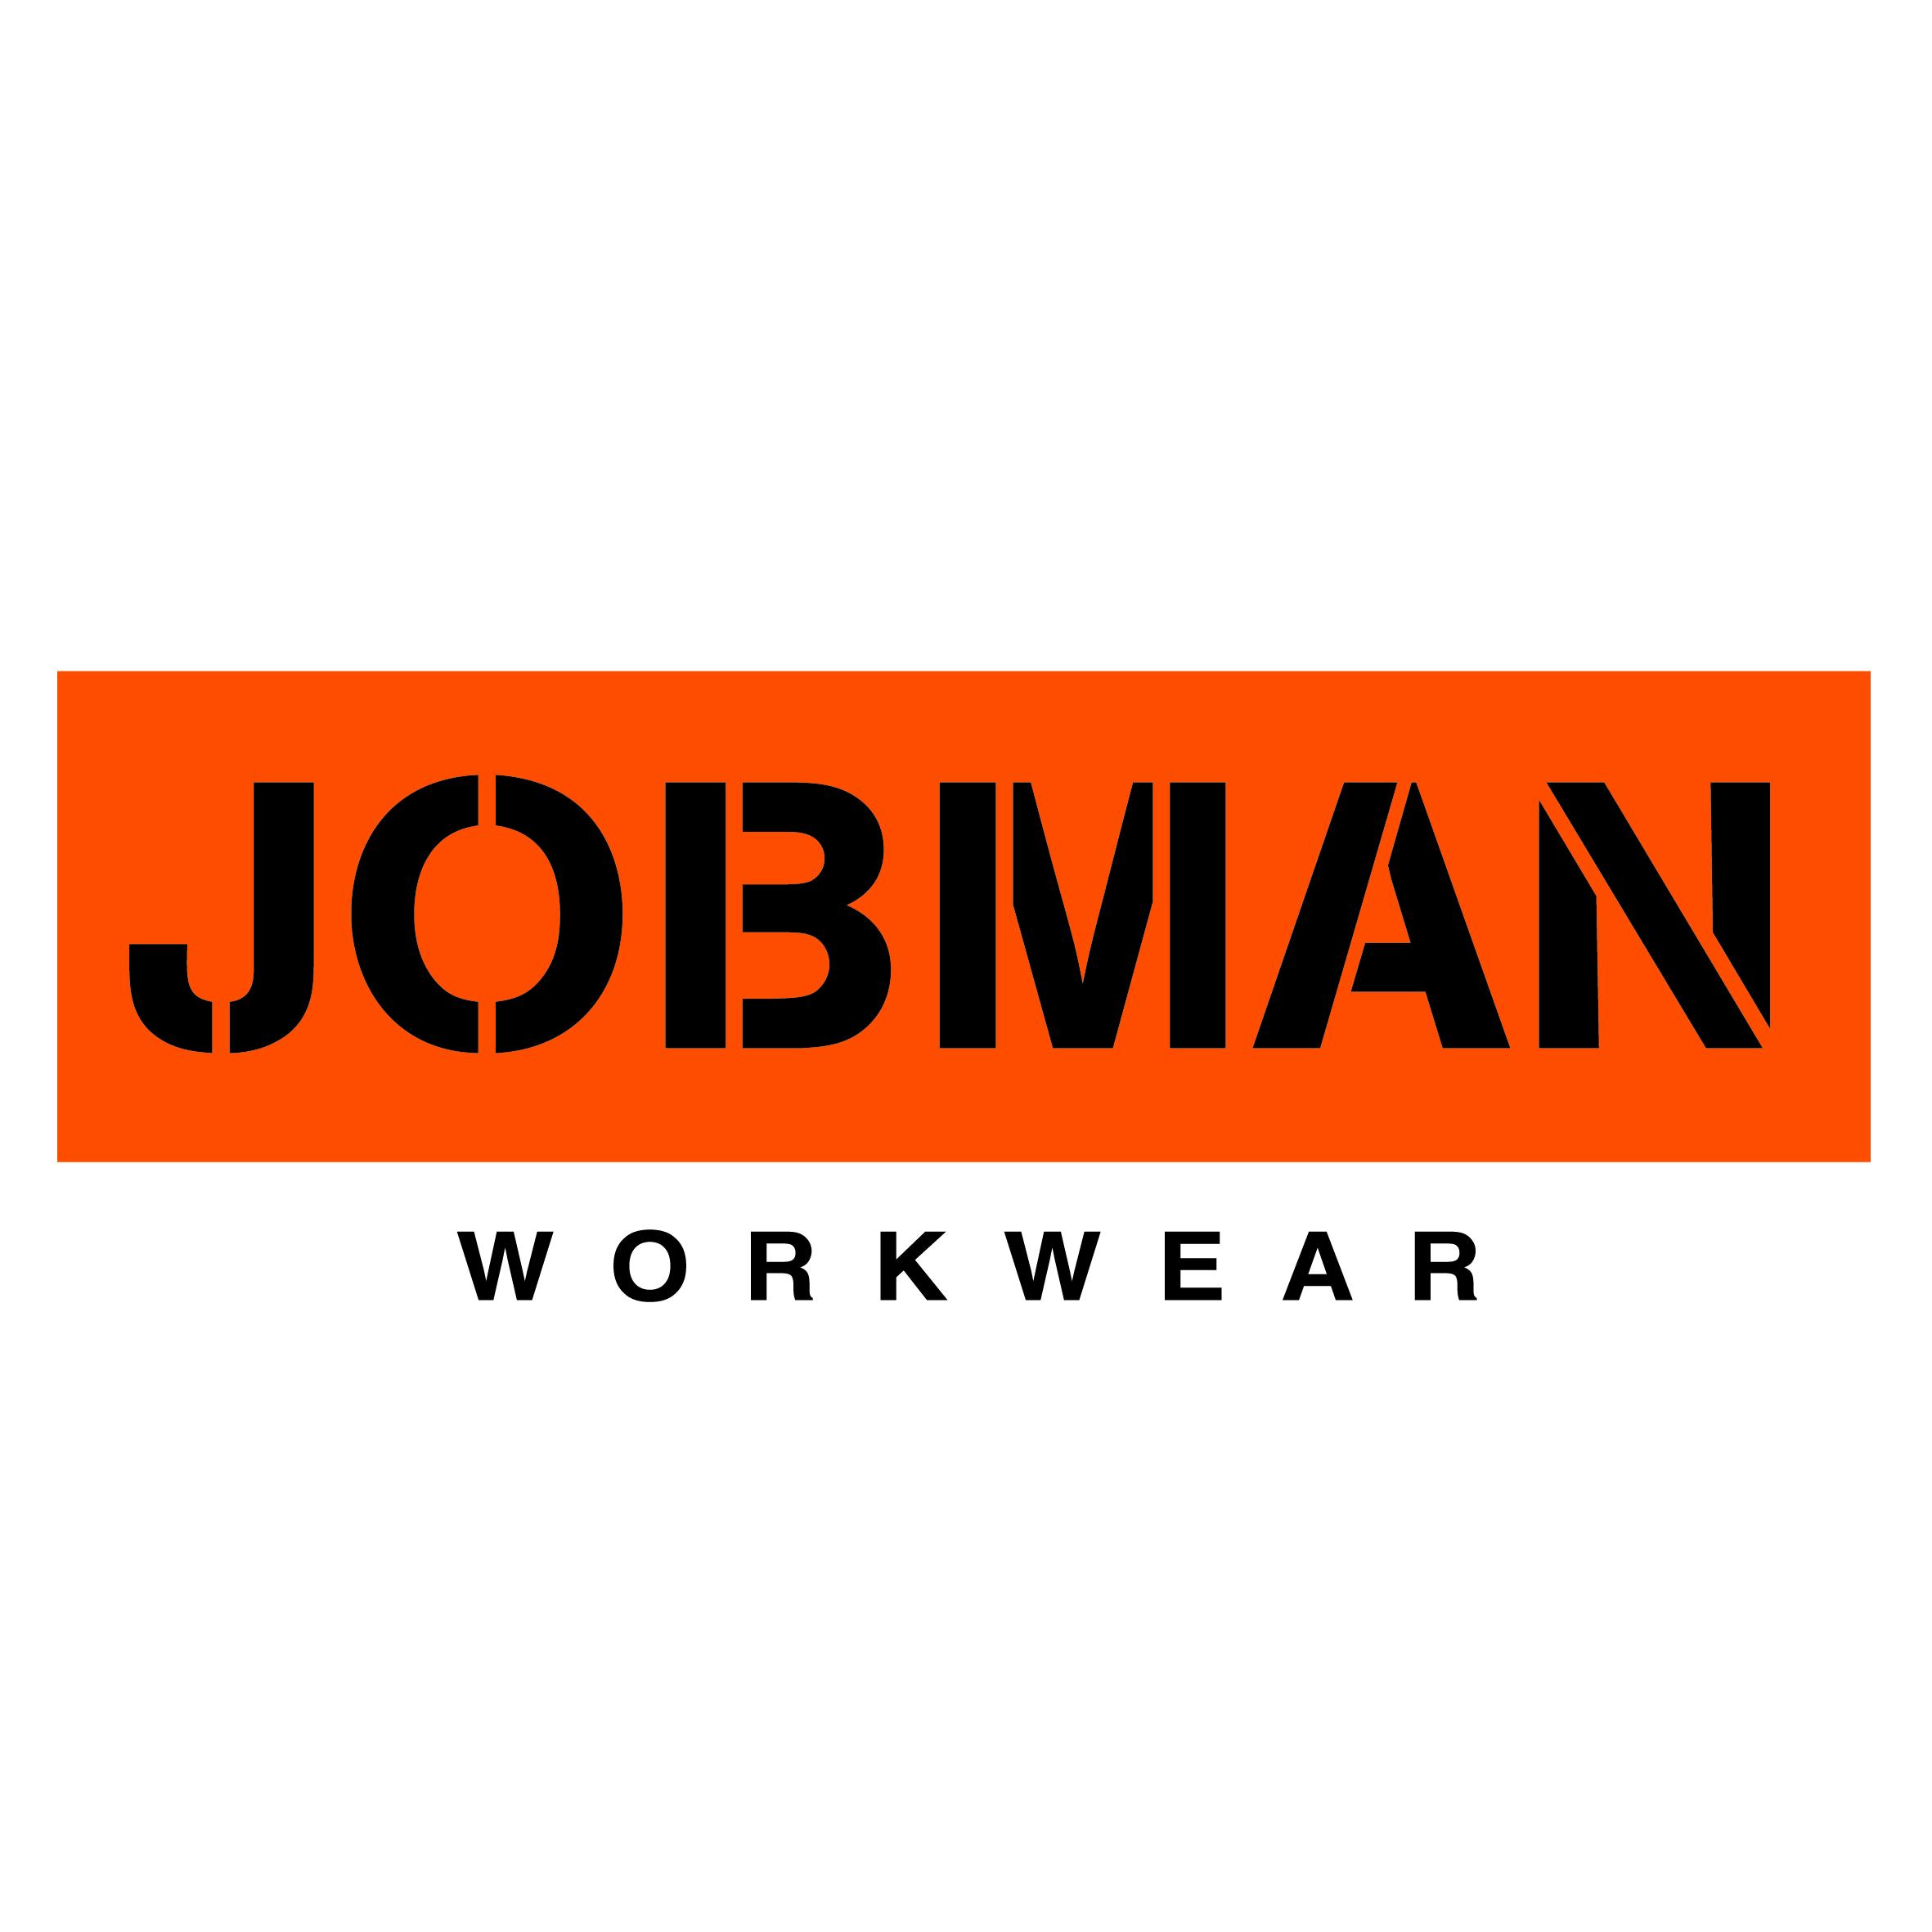 jobman_logo.jpg